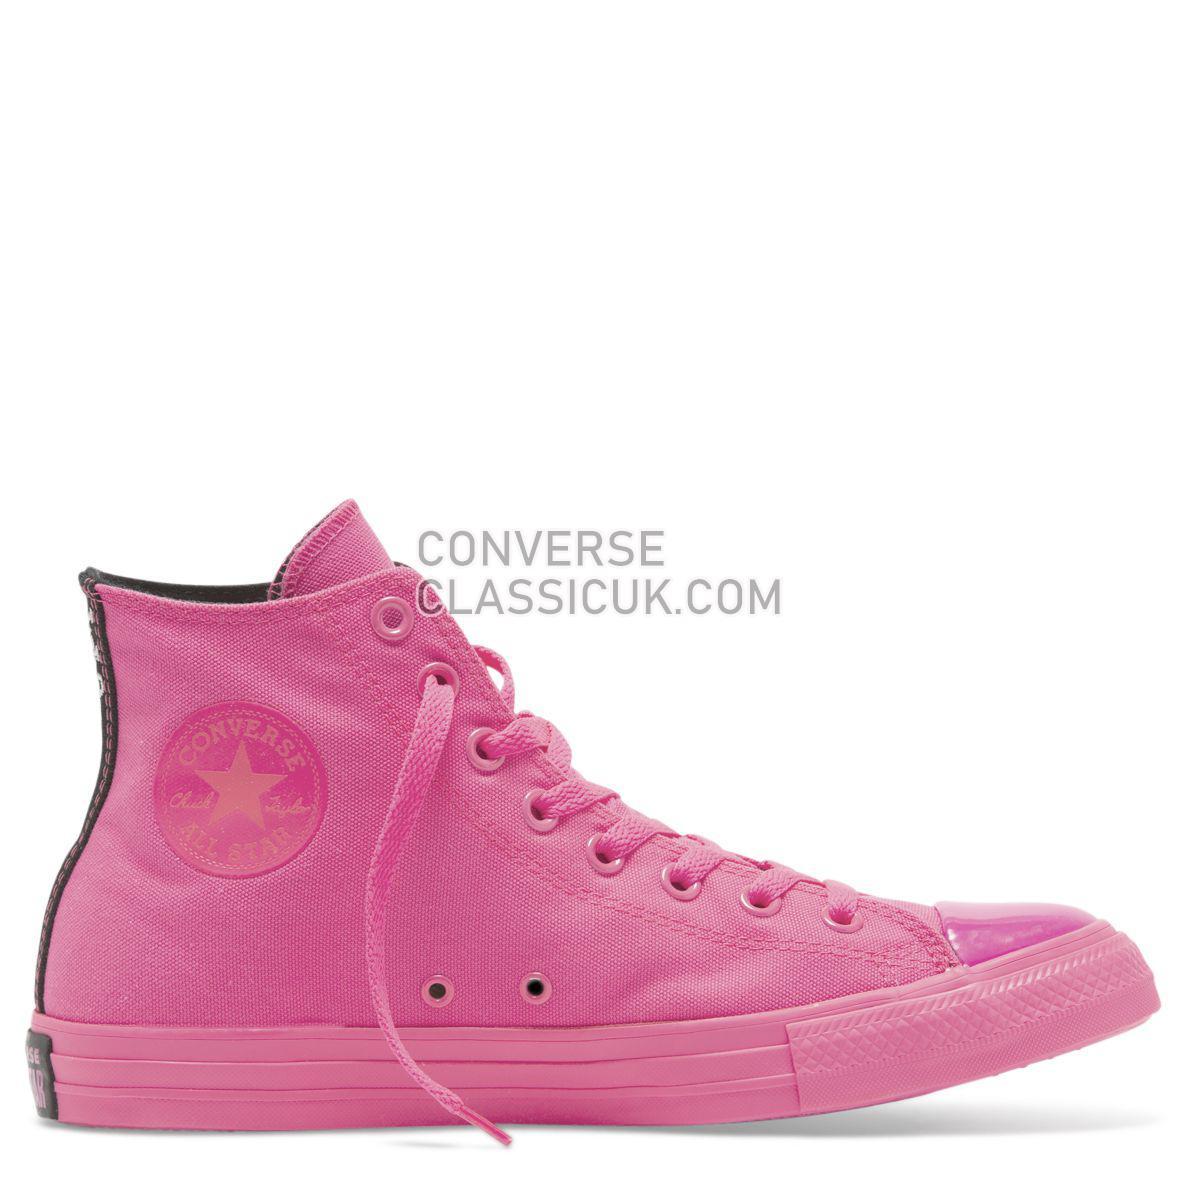 Converse X OPI Chuck Taylor All Star High Top Hyper Pink Womens 165658 Hyper Pink/Black/Hyper Pink Shoes